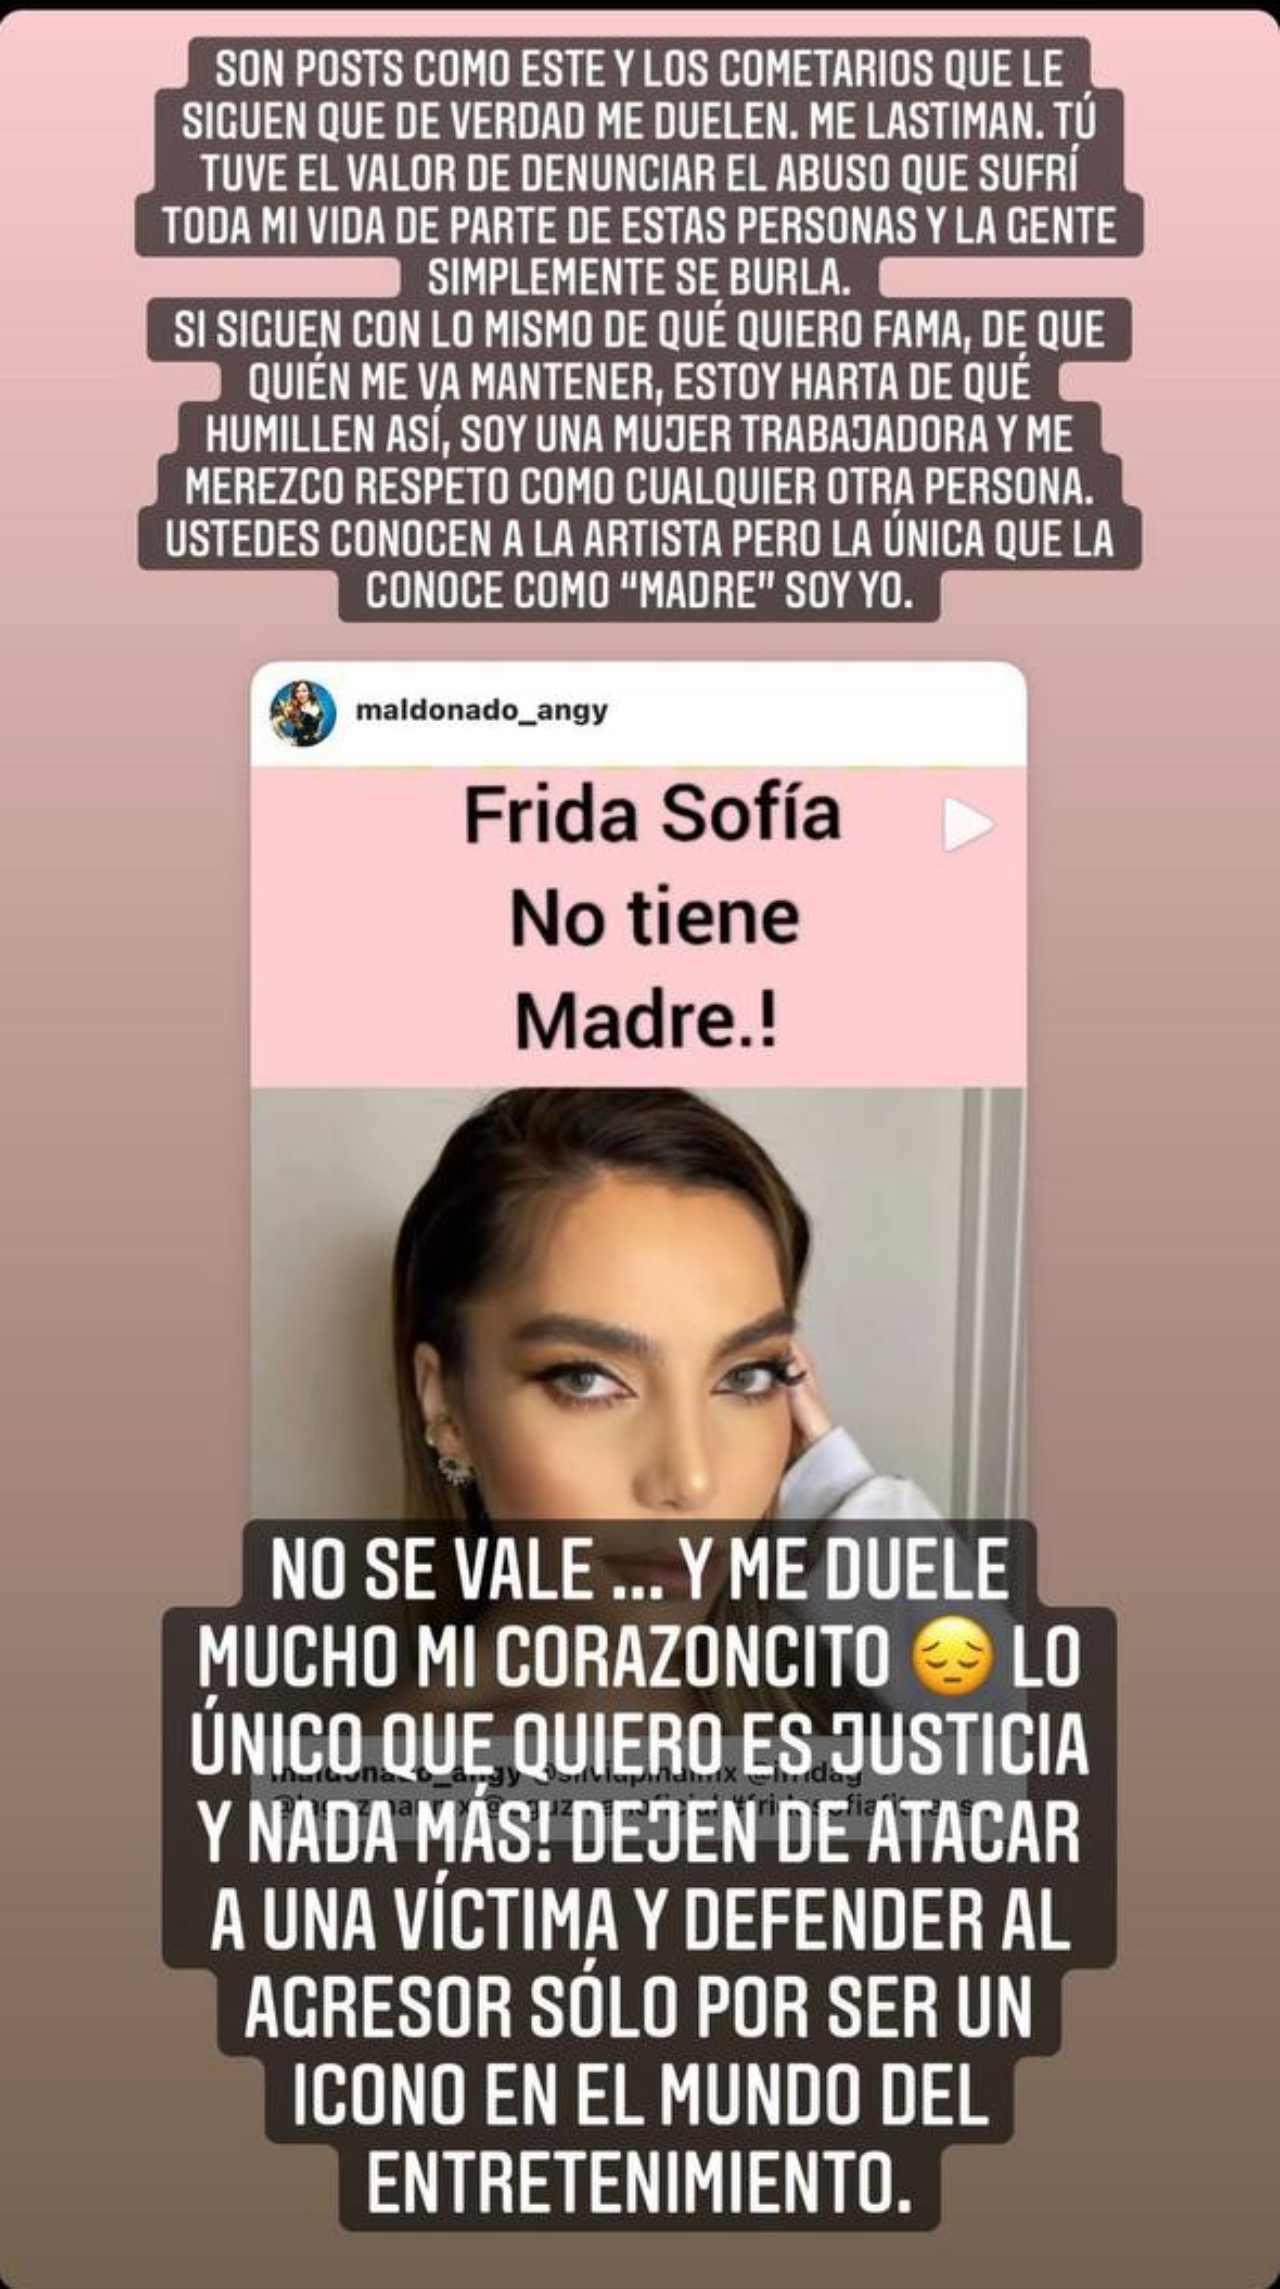 Frida Sofia responde a quienes la critican